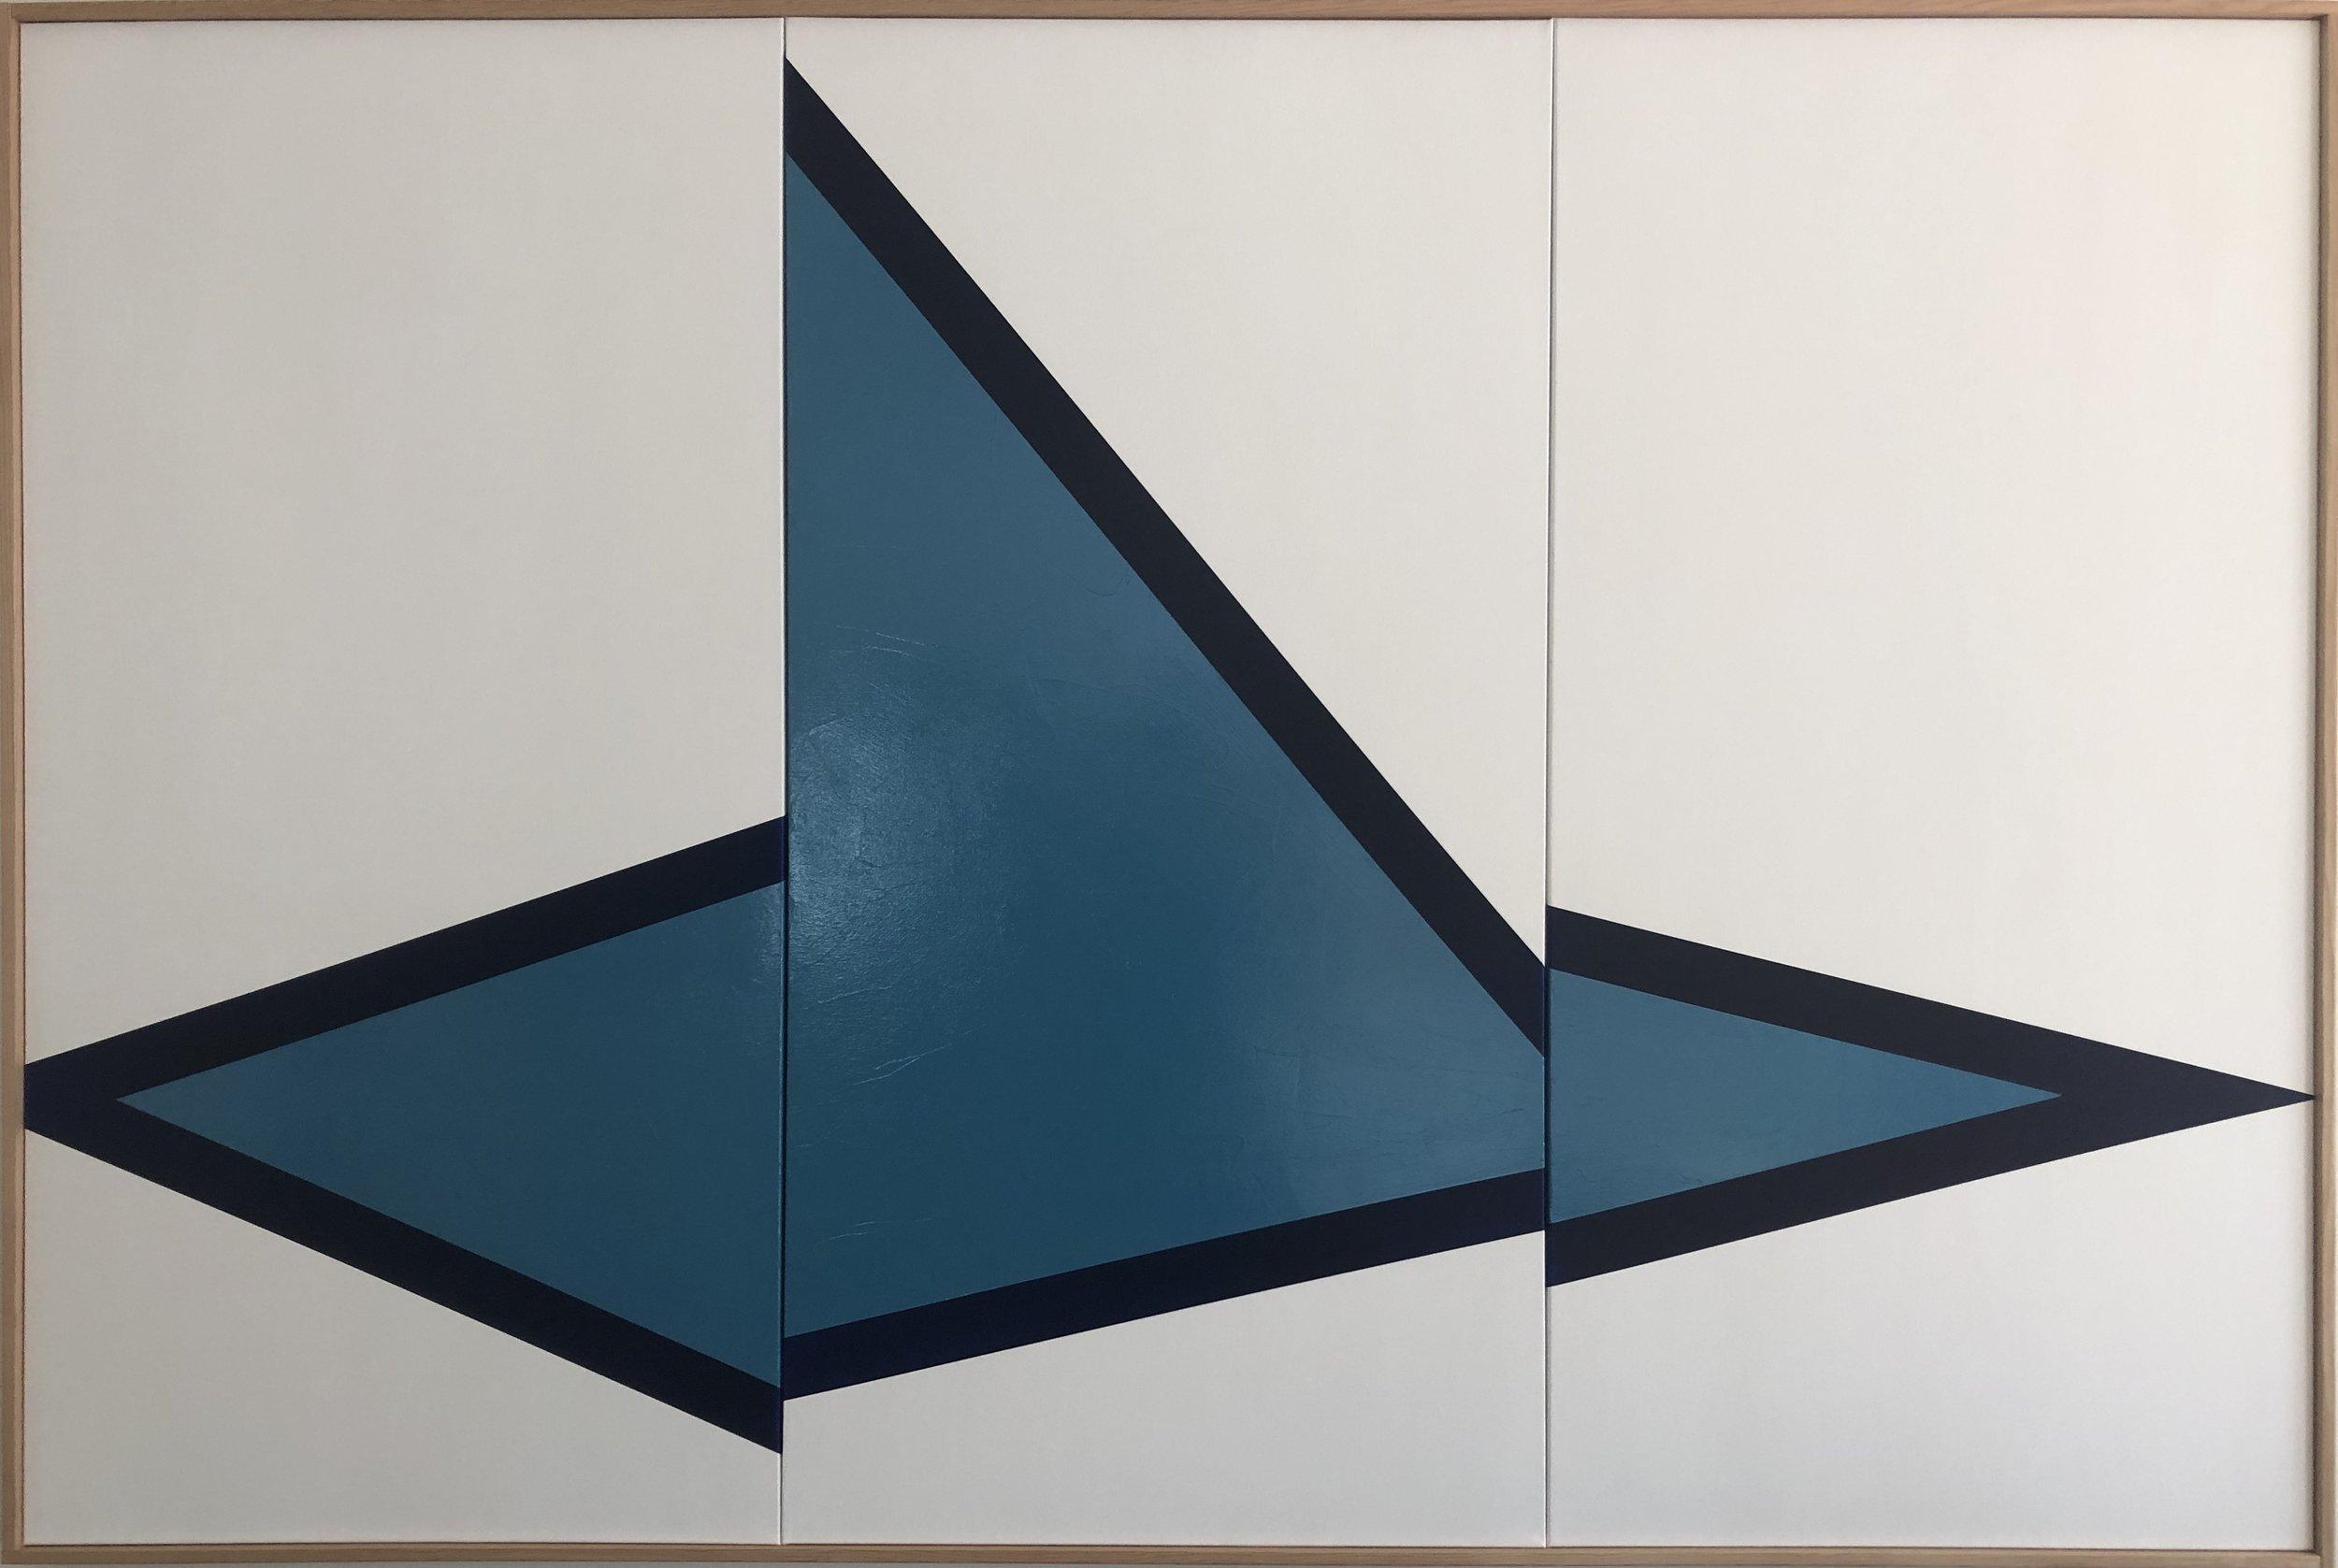 Blue On Point Triptych JET0639 - Image 1.JPG